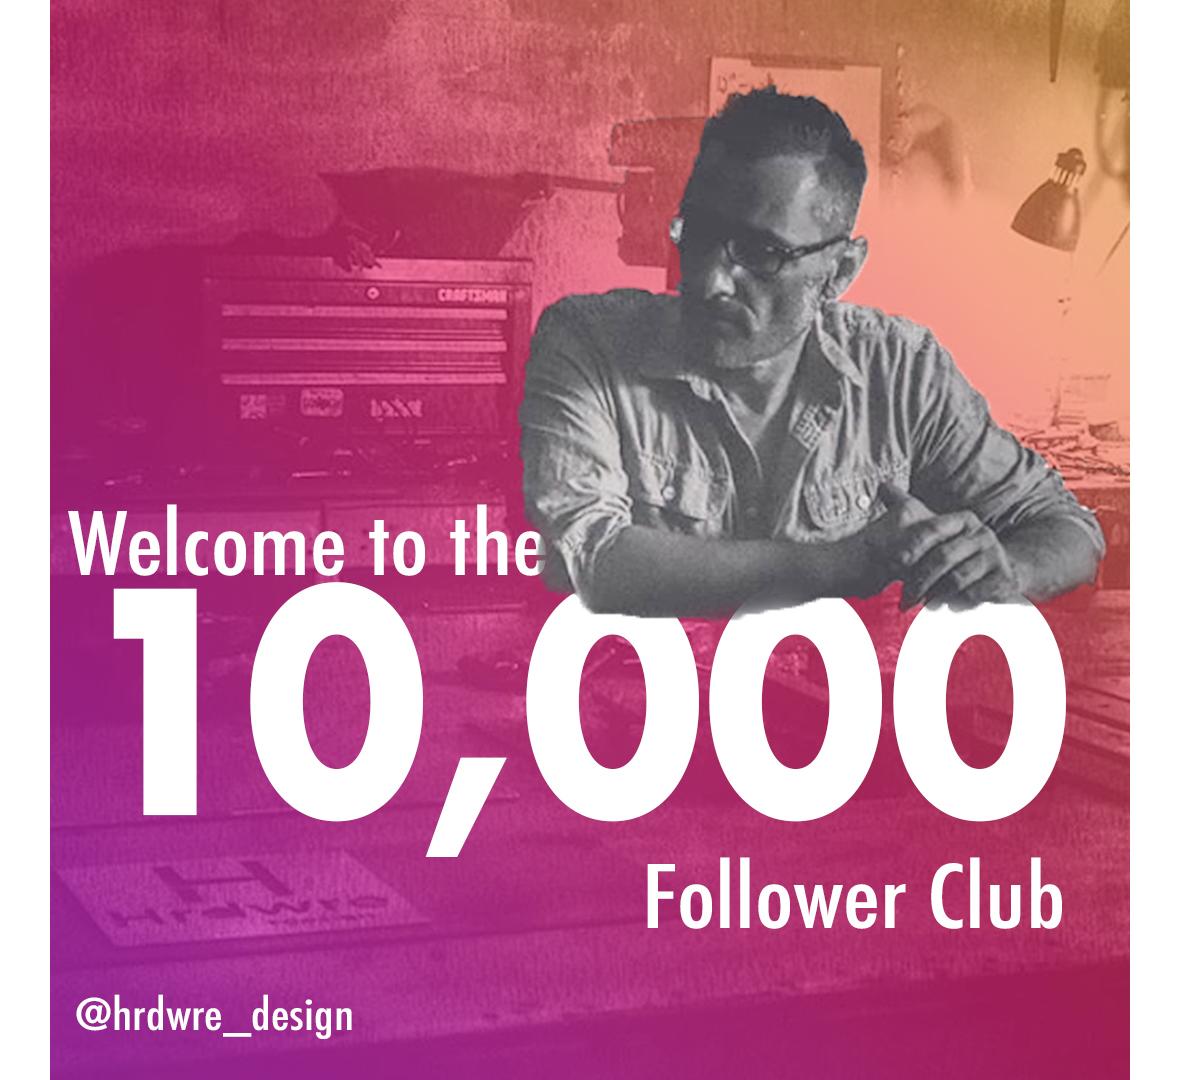 hrdwre_design_10k club.jpg